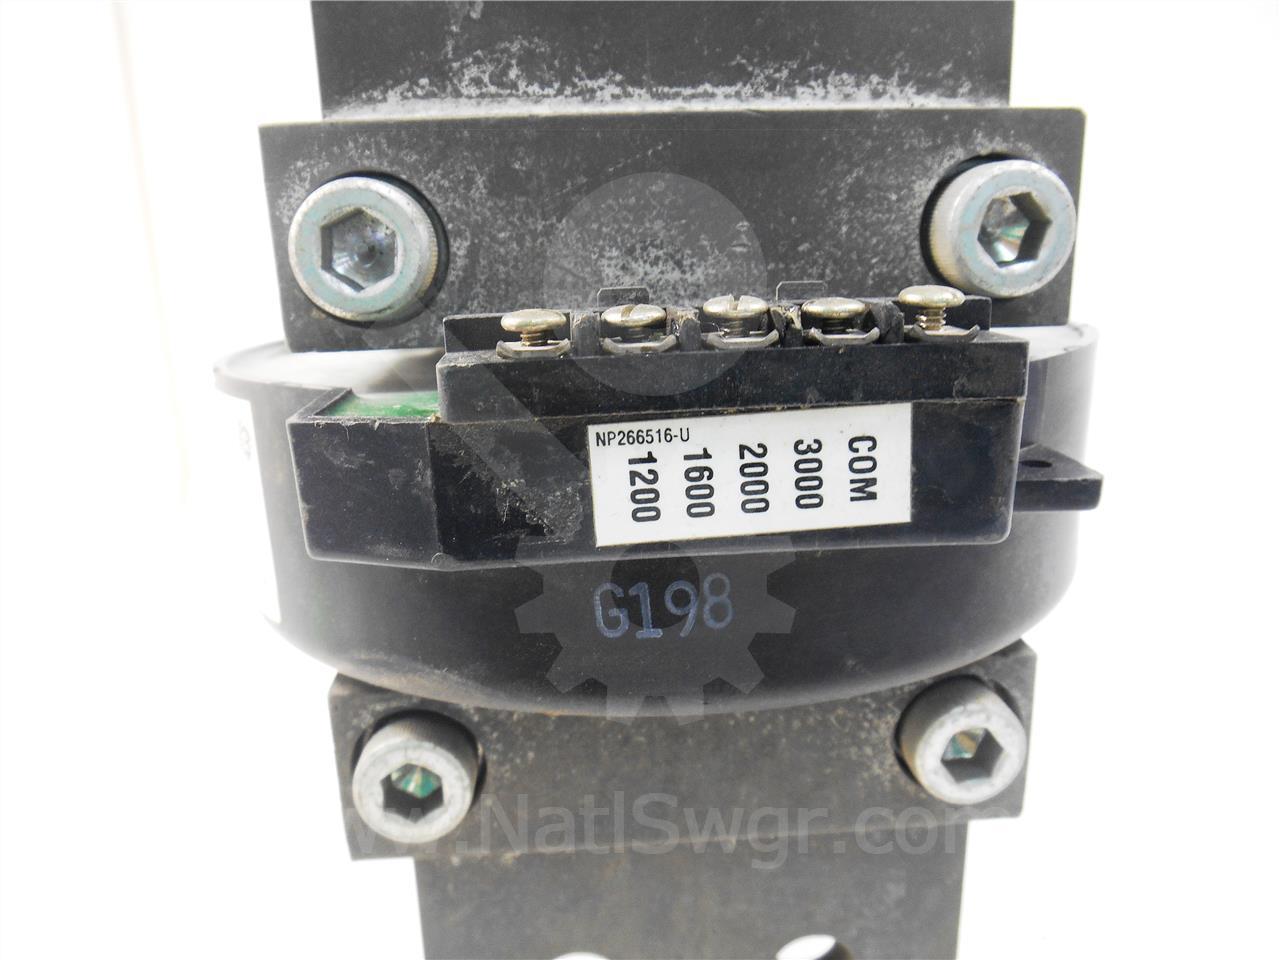 General Electric 1200-3000A GE MULTI RATIO NEUTRAL CURRENT TRANSFORMER MVT / ENTELLIGAURD